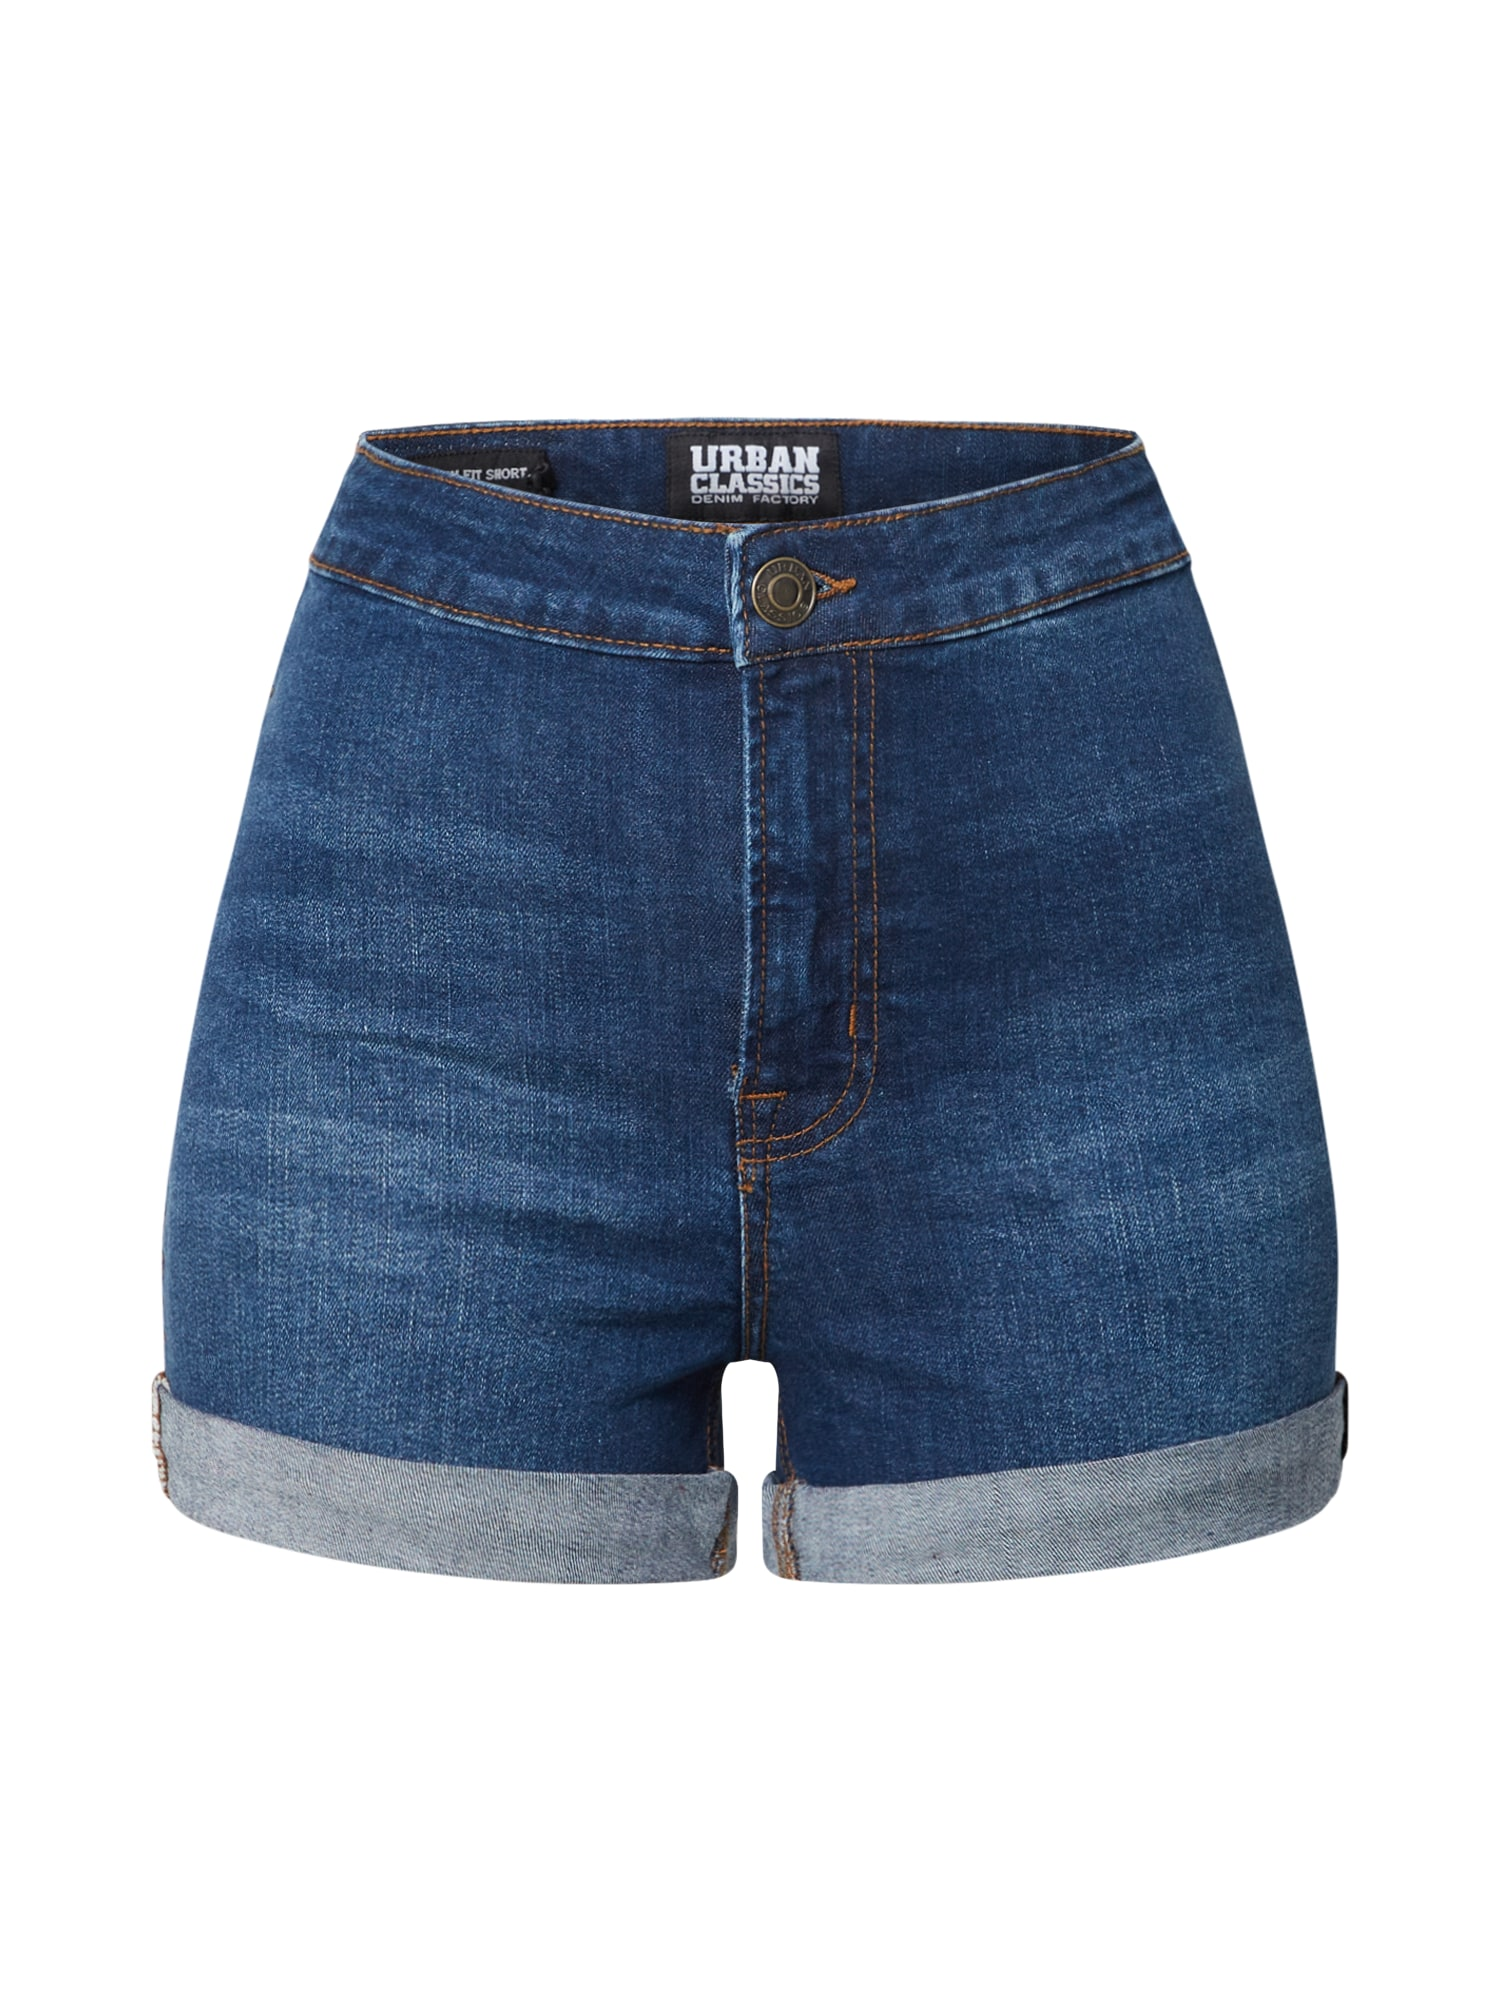 Urban Classics Jeans 'Ladies 5 Pocket Slim Fit Denim Shorts'  denim albastru